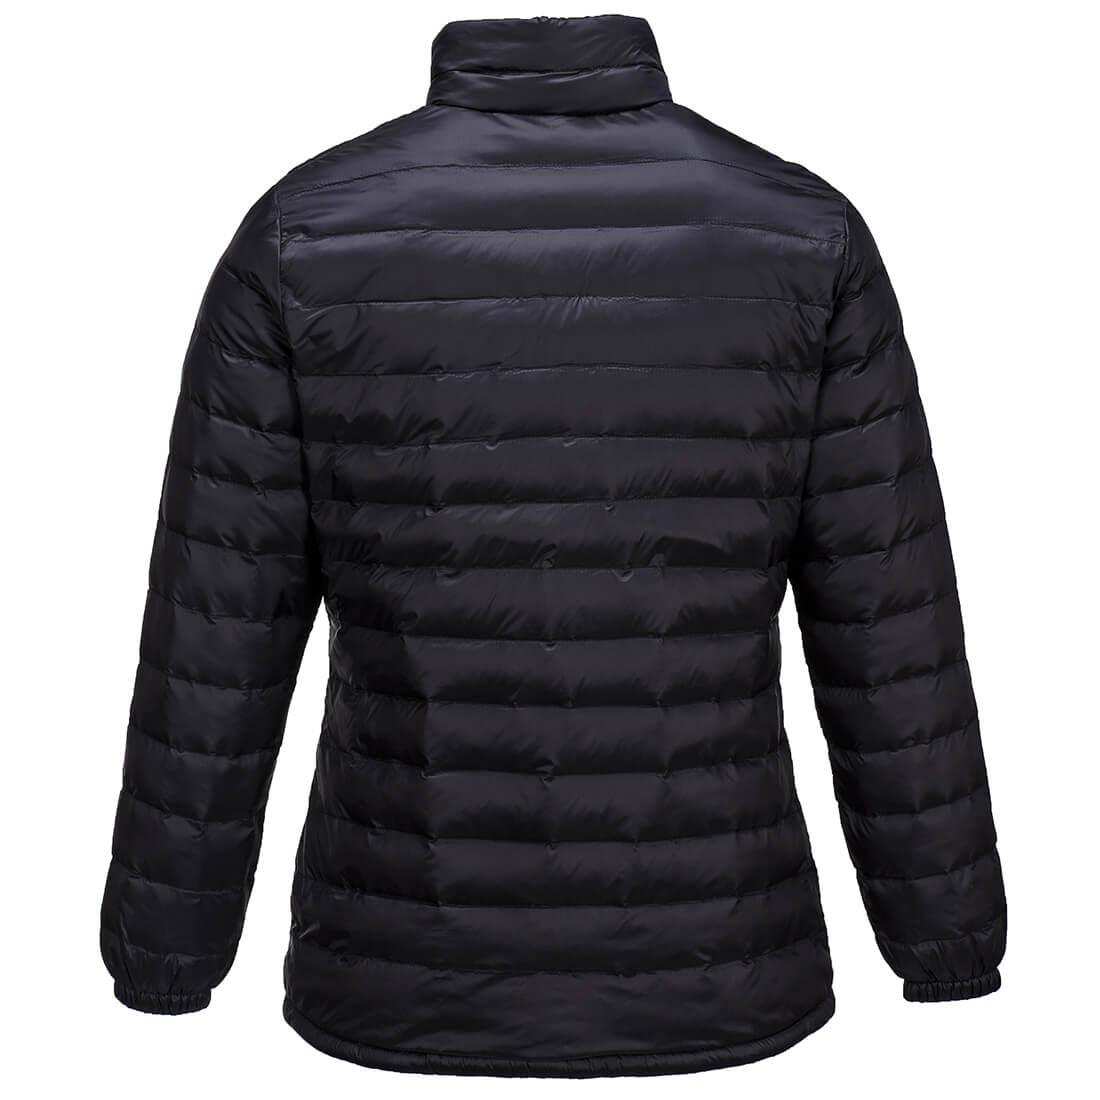 Jacheta de Dama Aspen - Imbracaminte de protectie